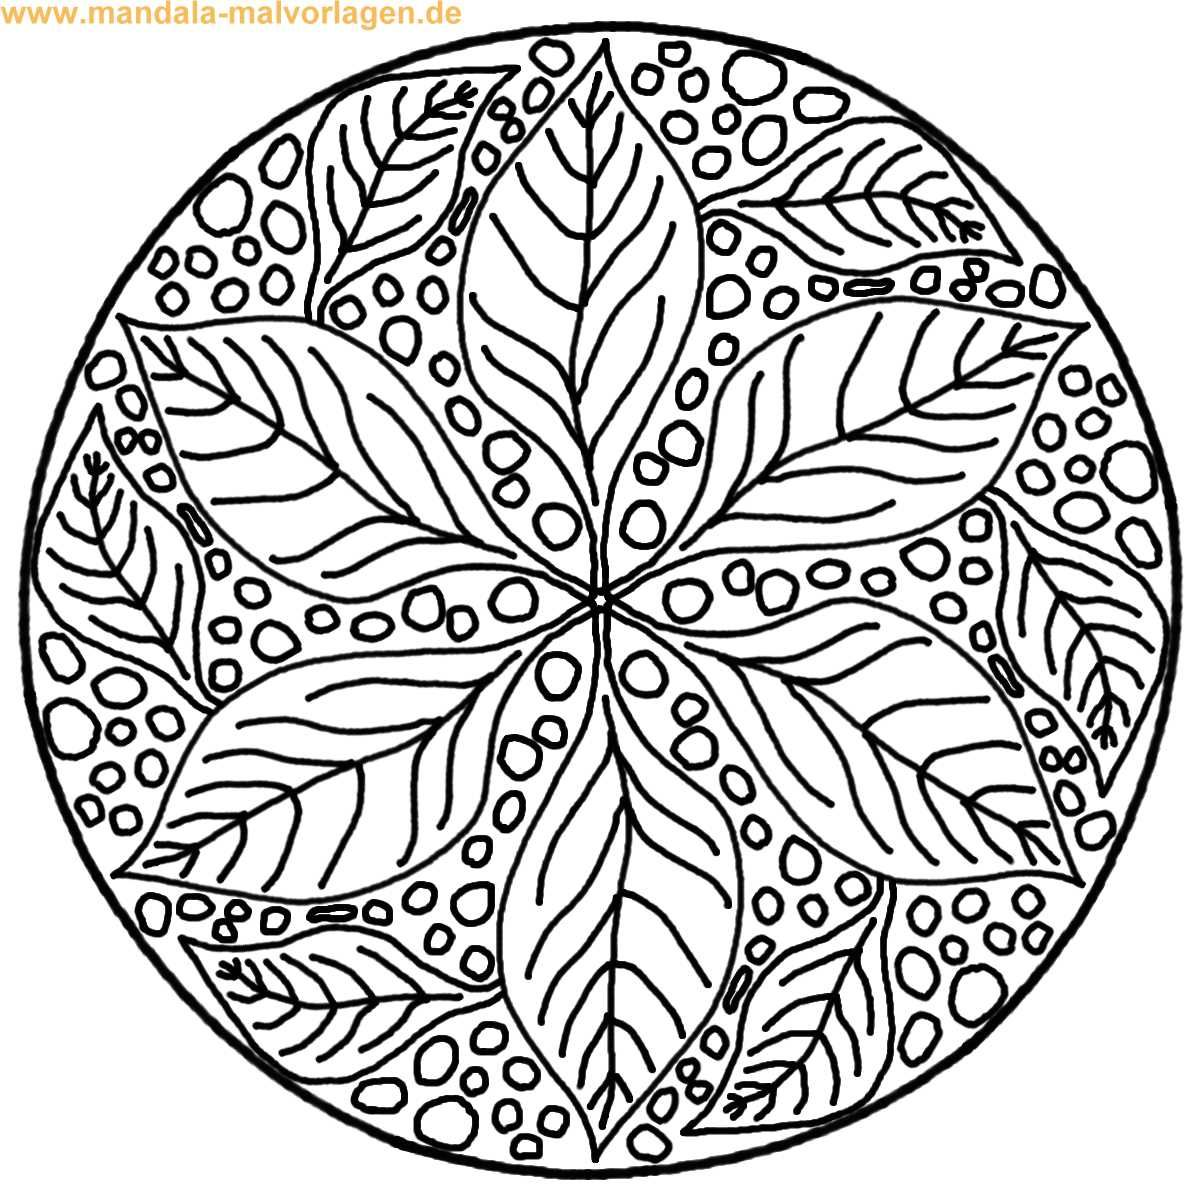 Malvorlagen Herbst Mandala | My blog